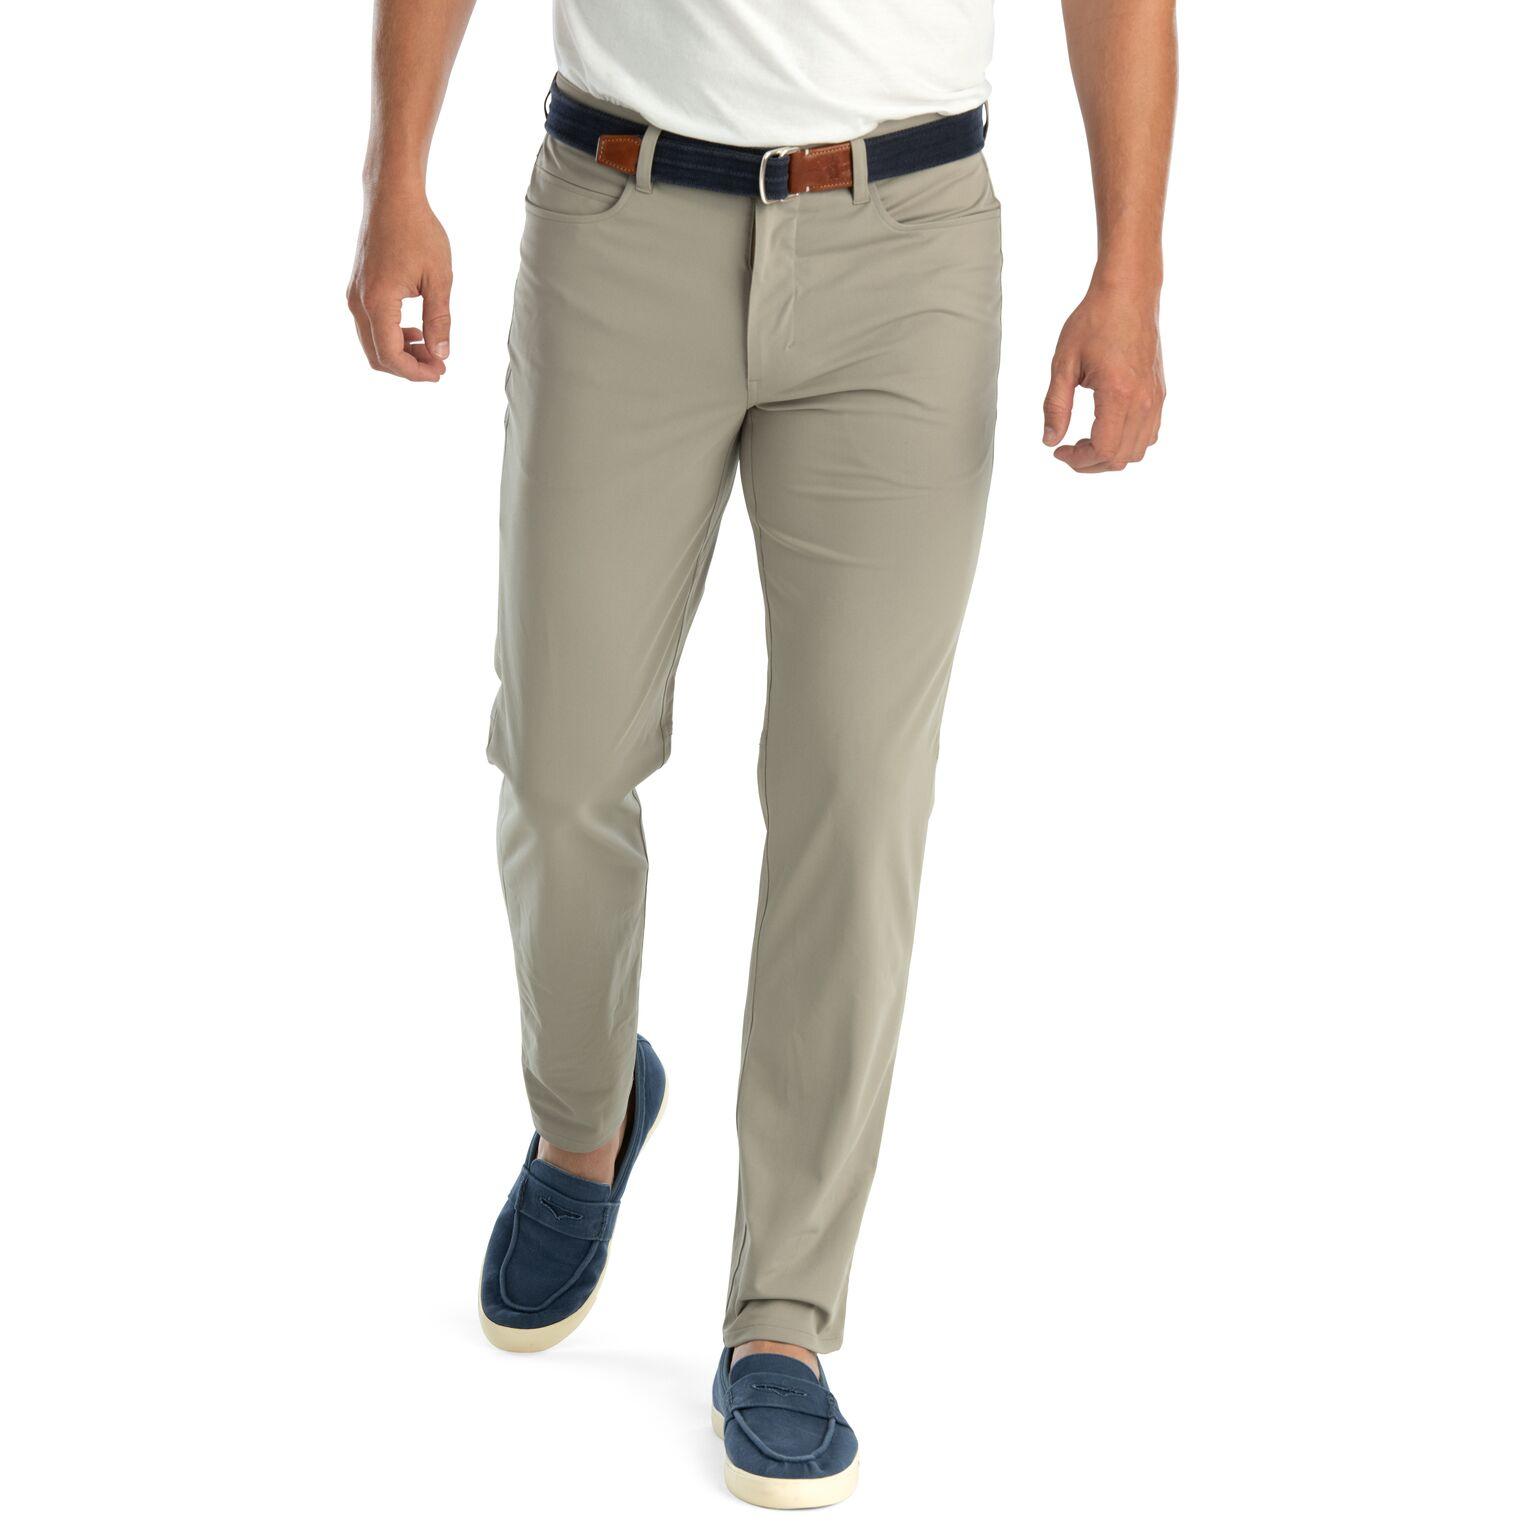 Cross Country Prep-Formance Pants (Light Khaki)